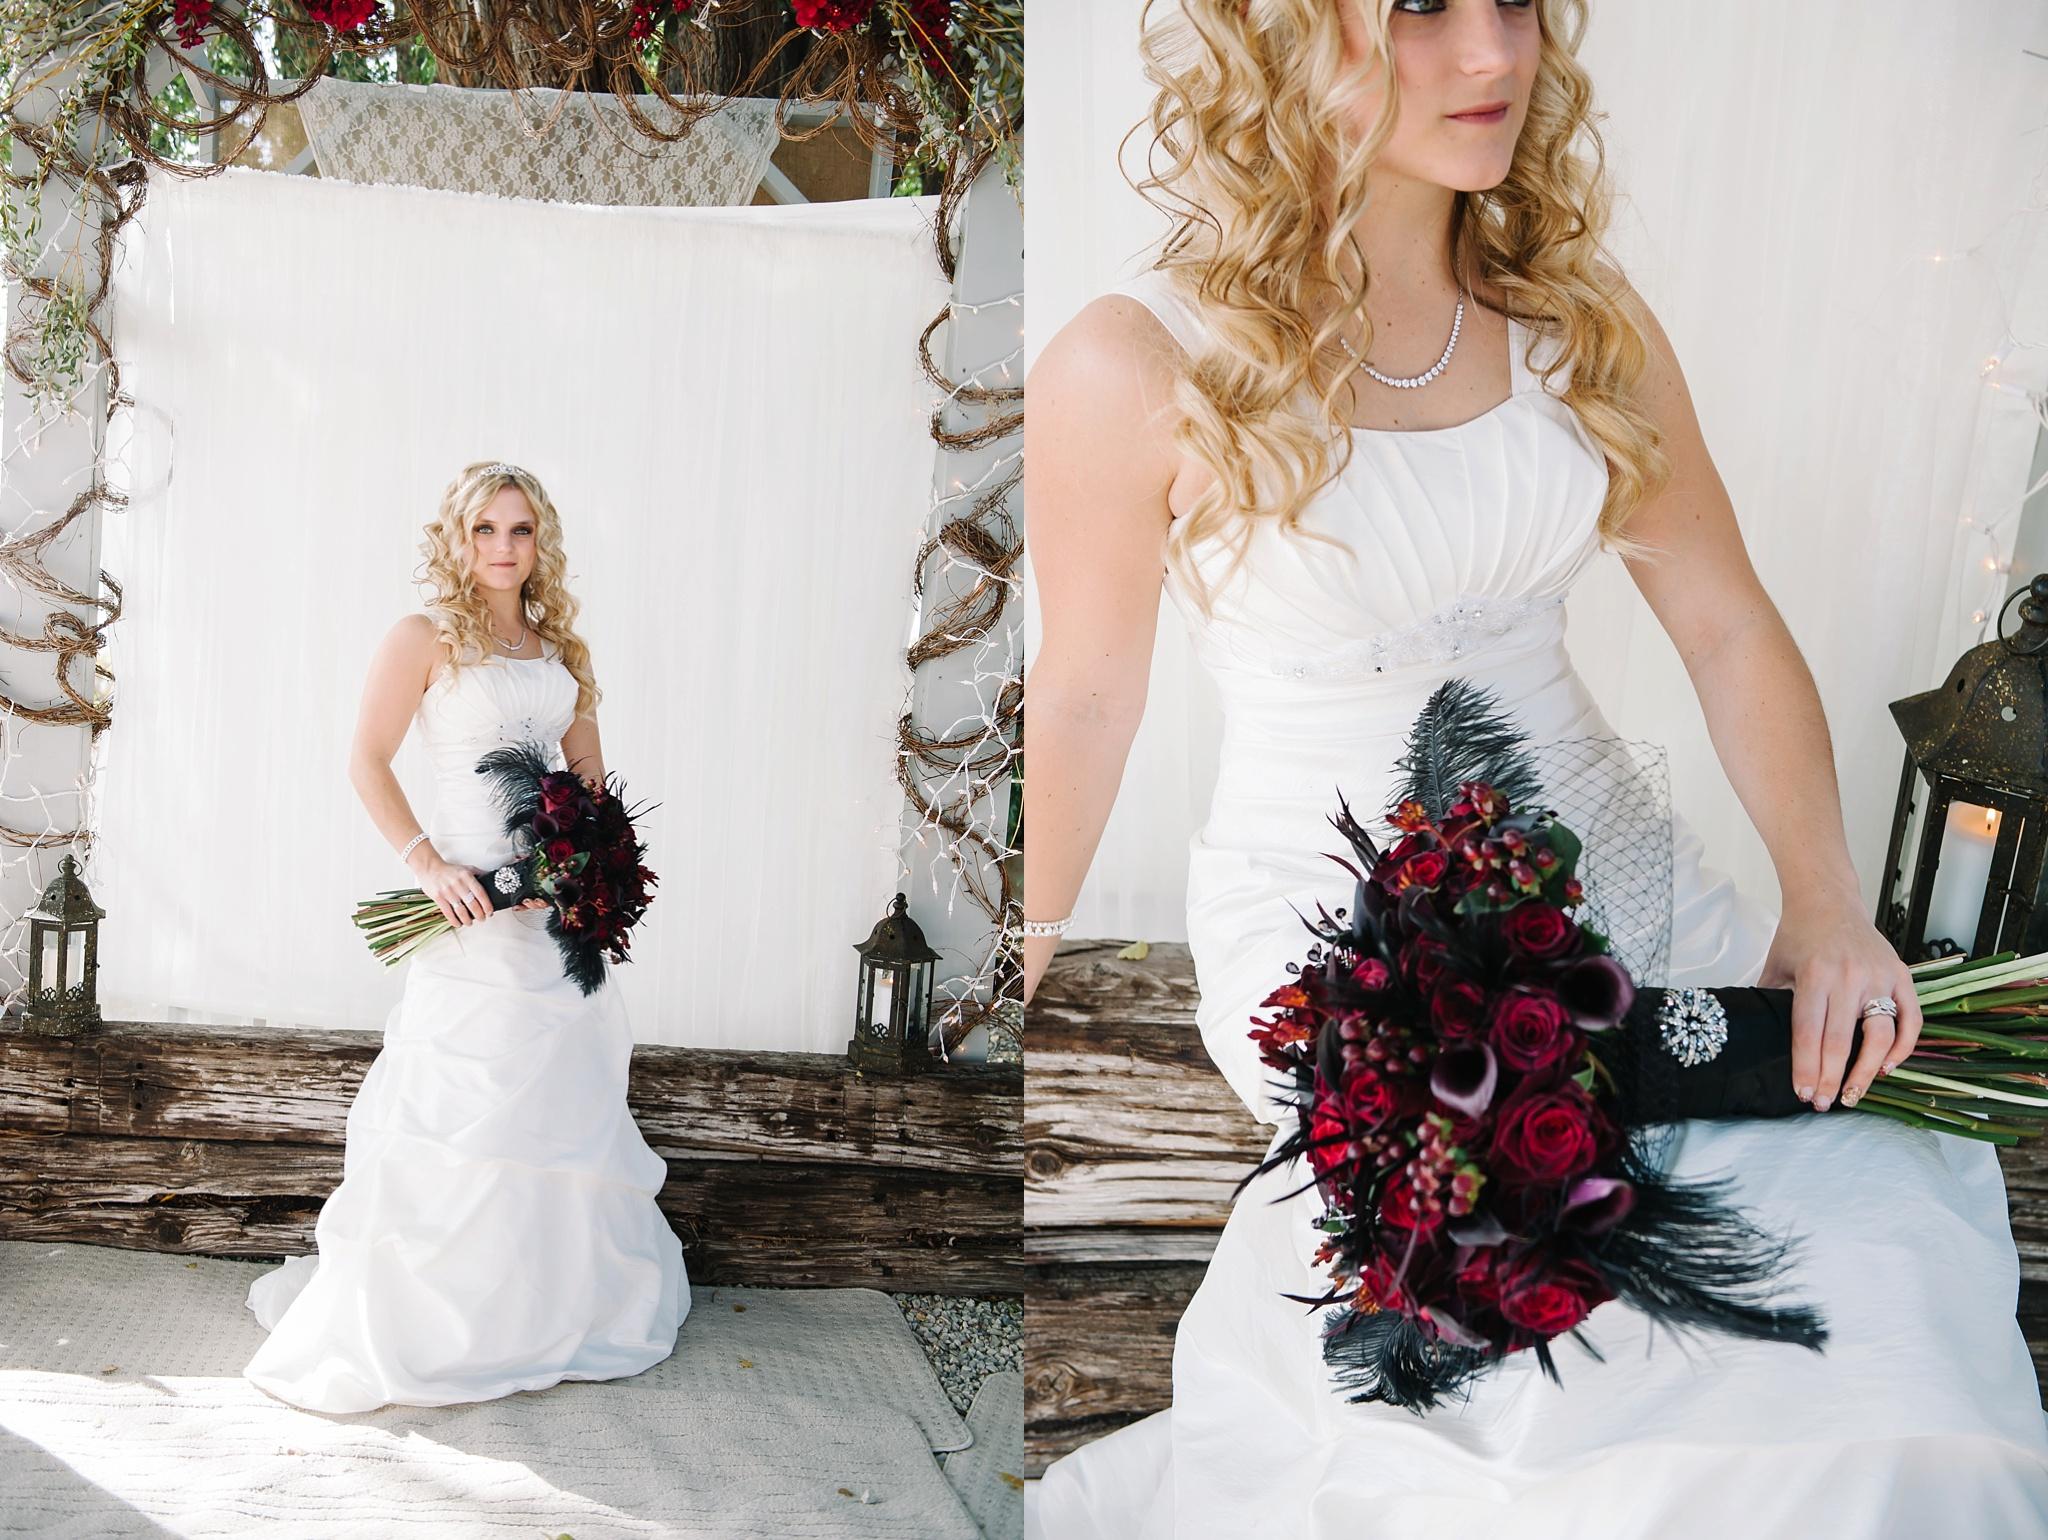 SLC Utah Wedding Photographer Ali Sumsion 063